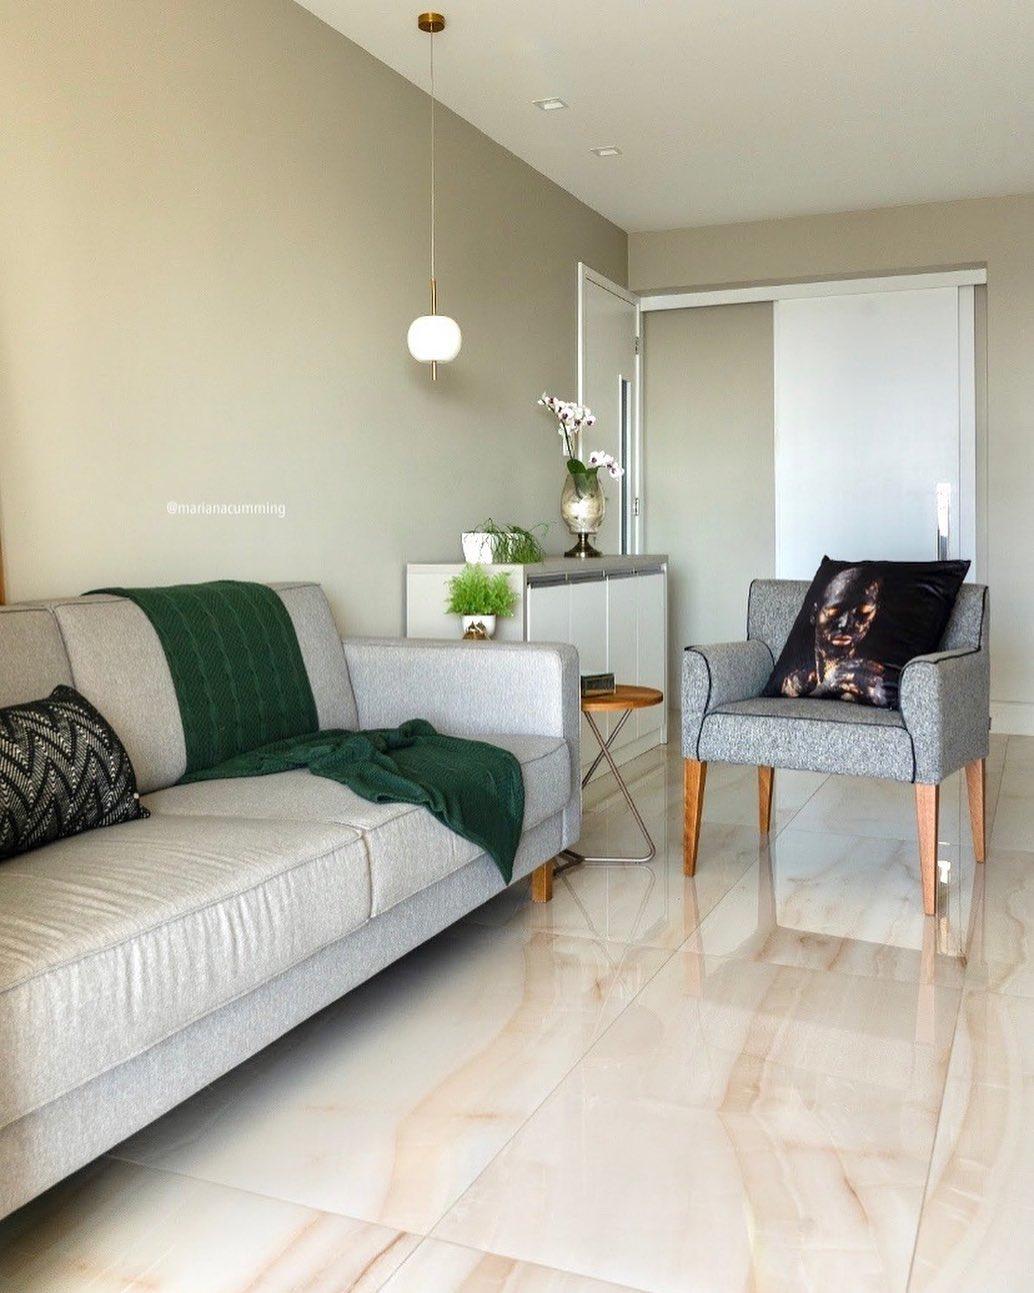 sofa e poltrona cinza em sala neutra